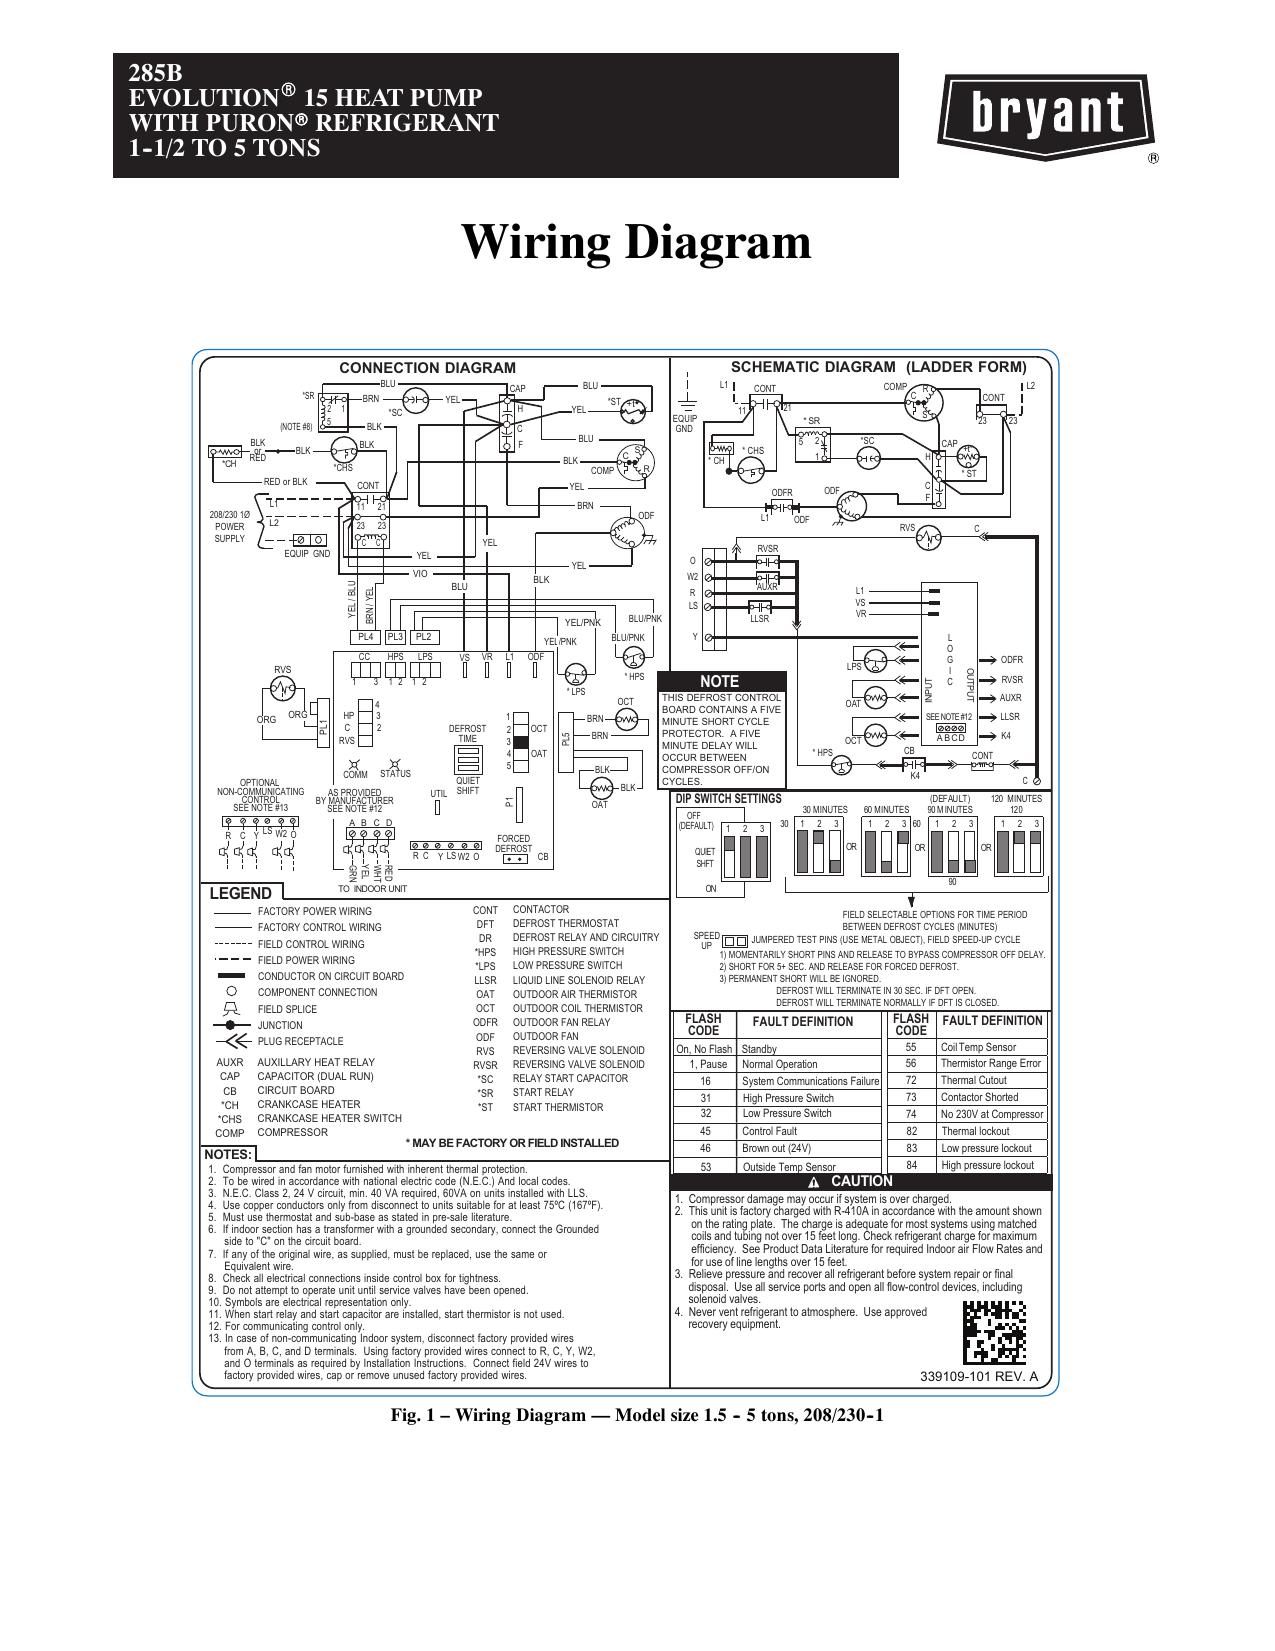 Refrigeration Wiring Diagram 5 Ton - Diamond 90 Wiring Diagram -  light-switch.yenpancane.jeanjaures37.fr | Refrigeration Wiring Diagram 5 Ton |  | Wiring Diagram Resource